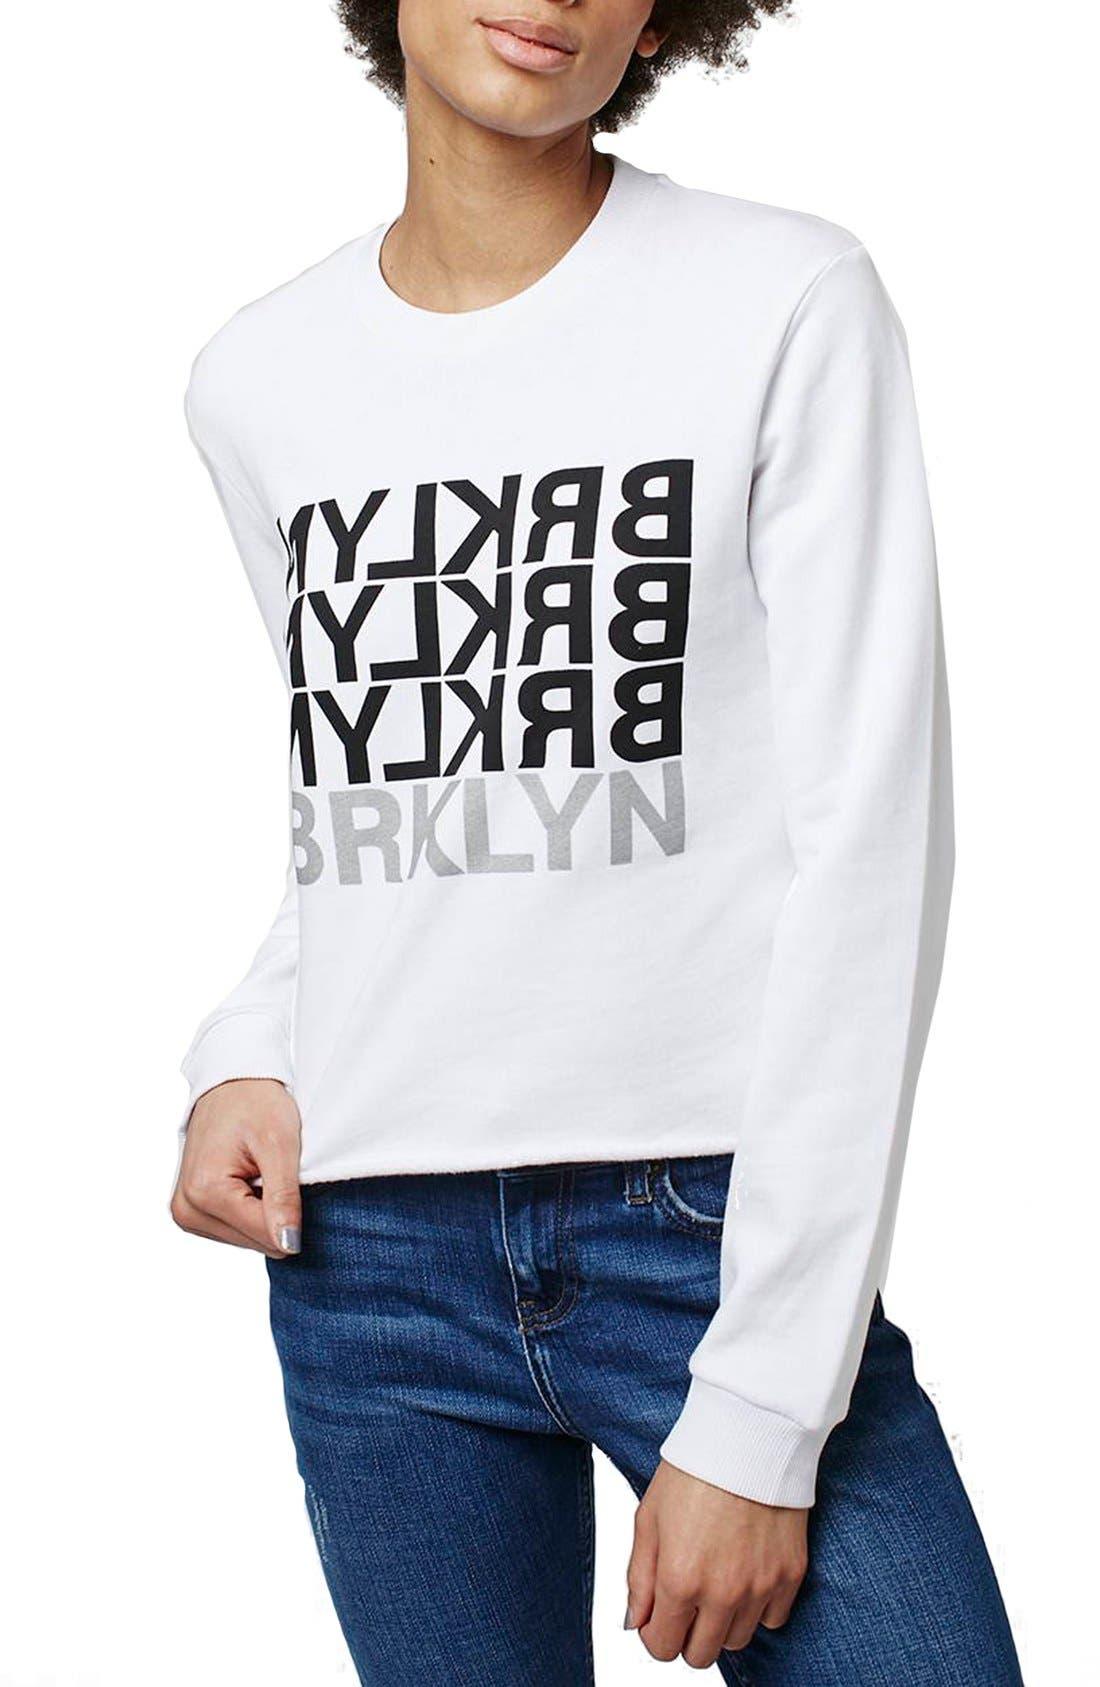 Alternate Image 1 Selected - Topshop 'Brklyn' Graphic Sweatshirt